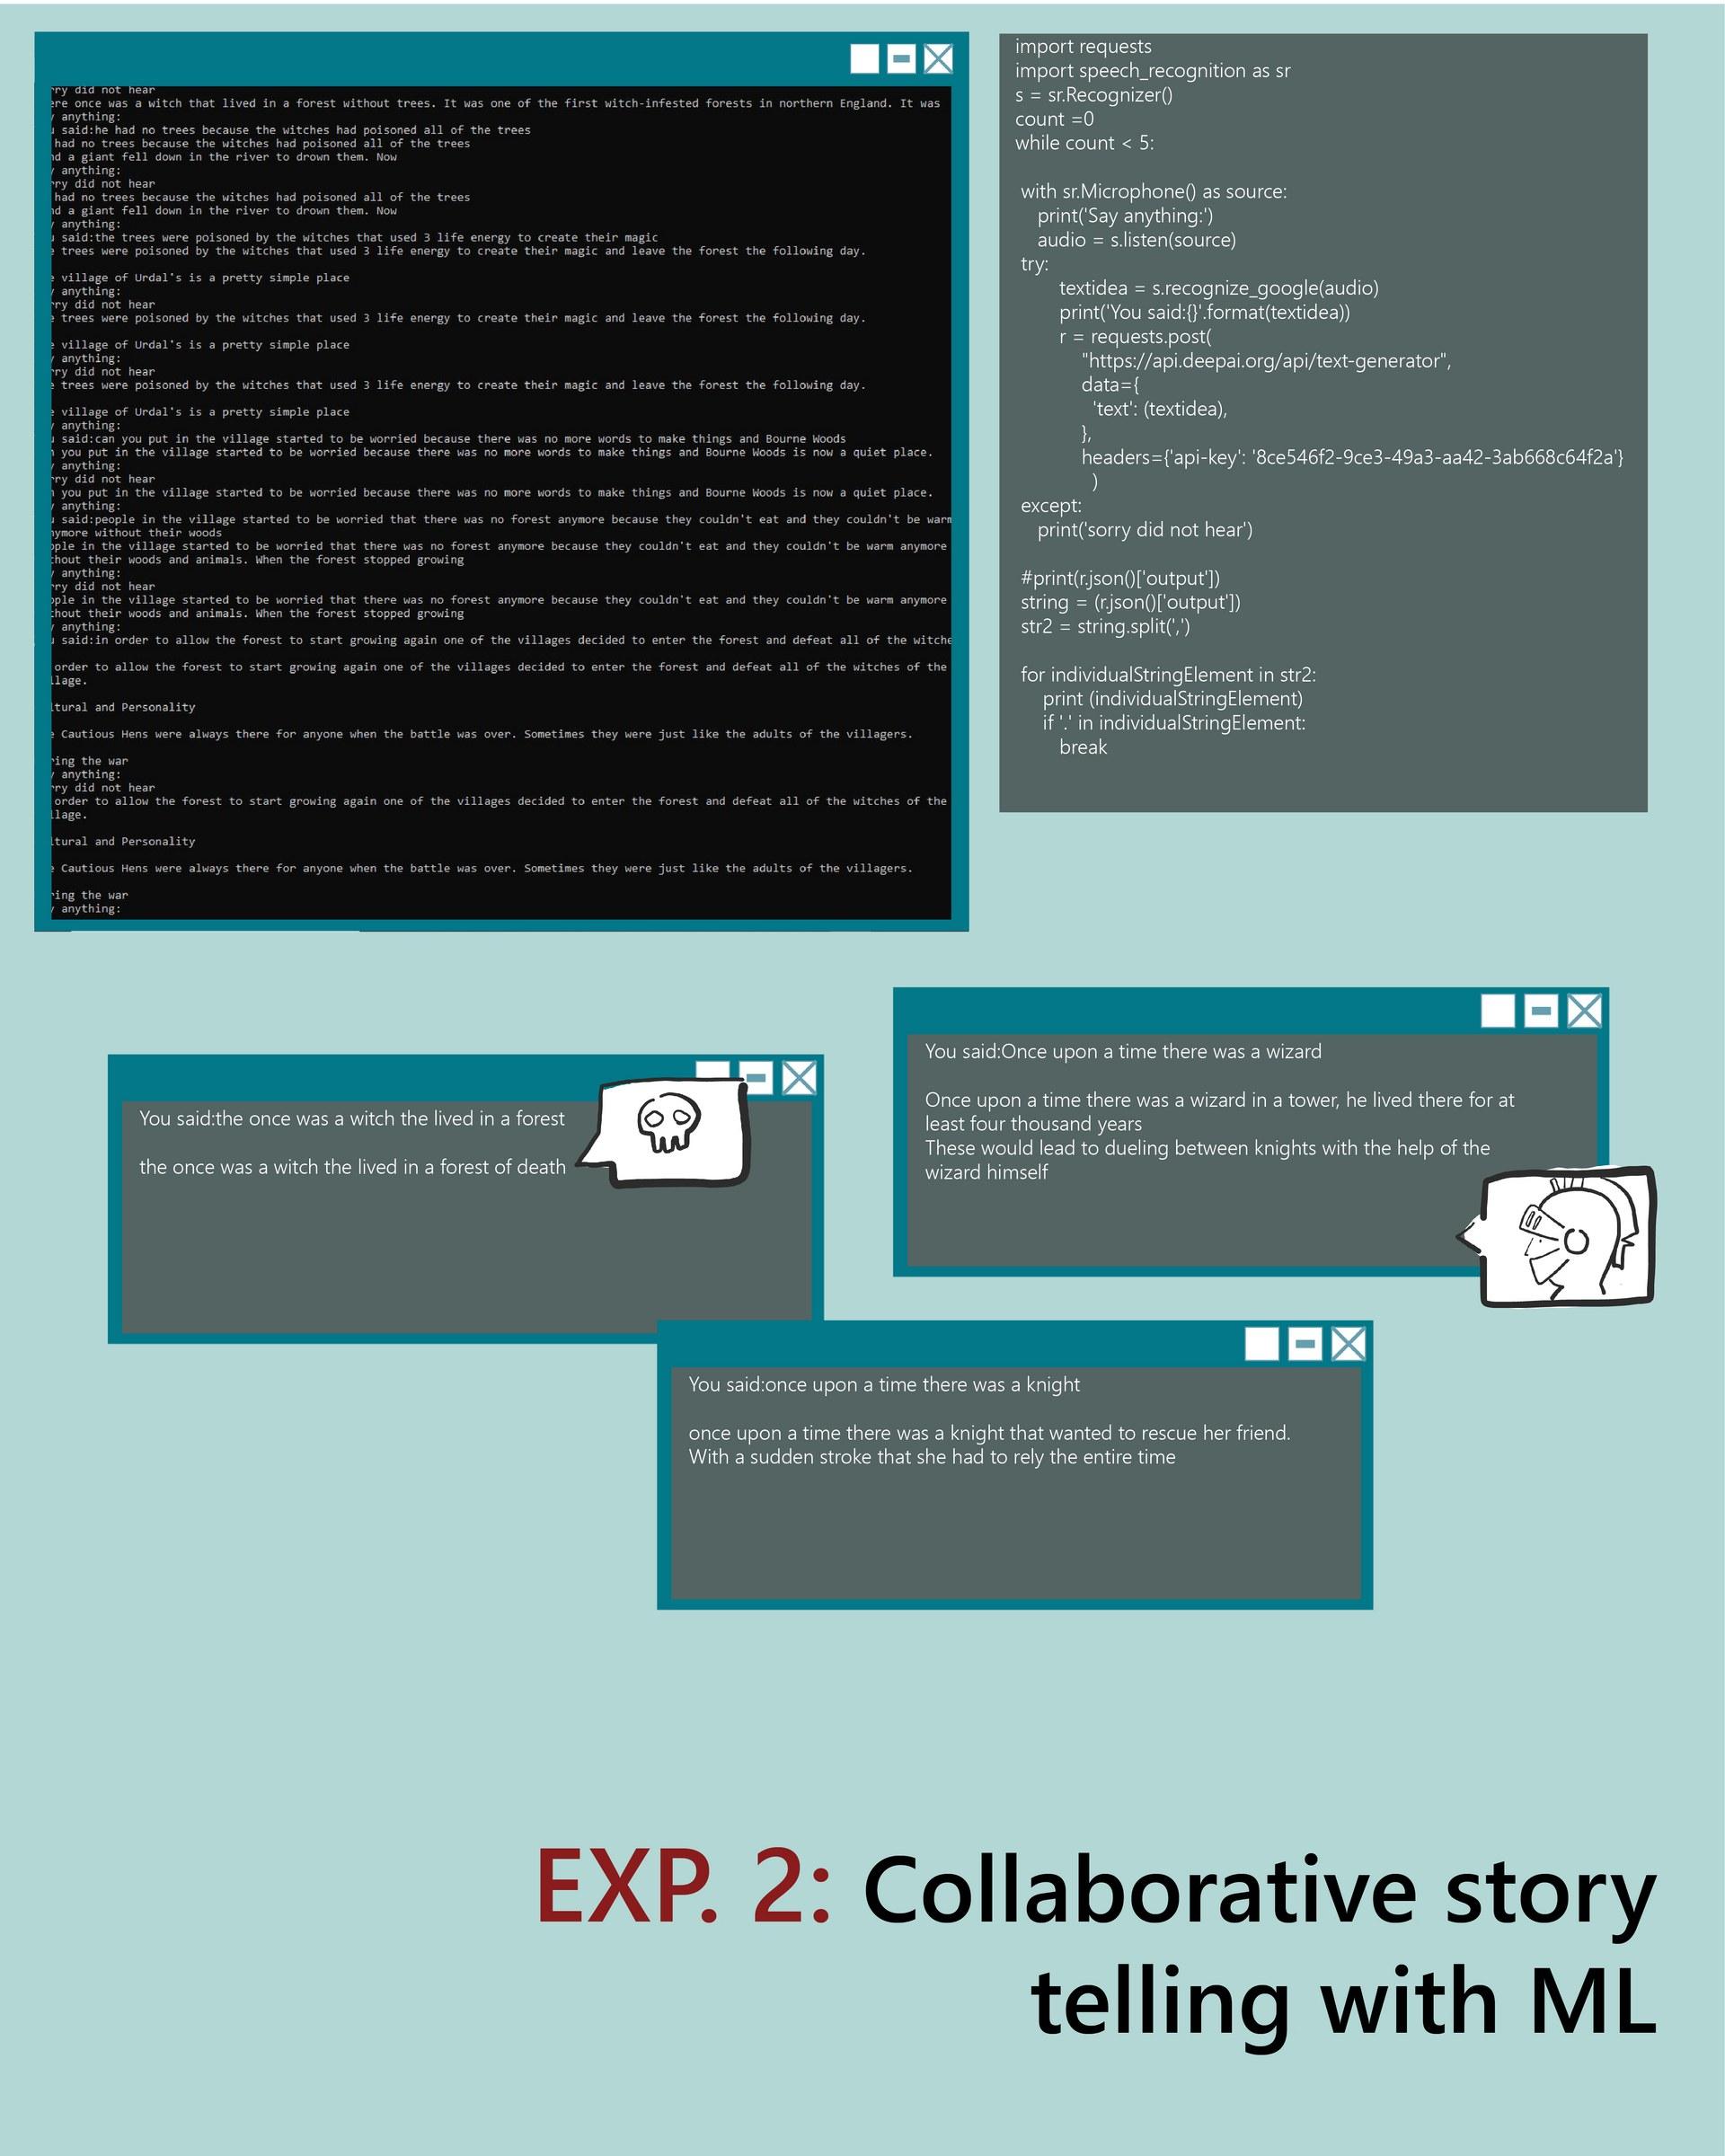 Collaborative story telling: Human and Machine